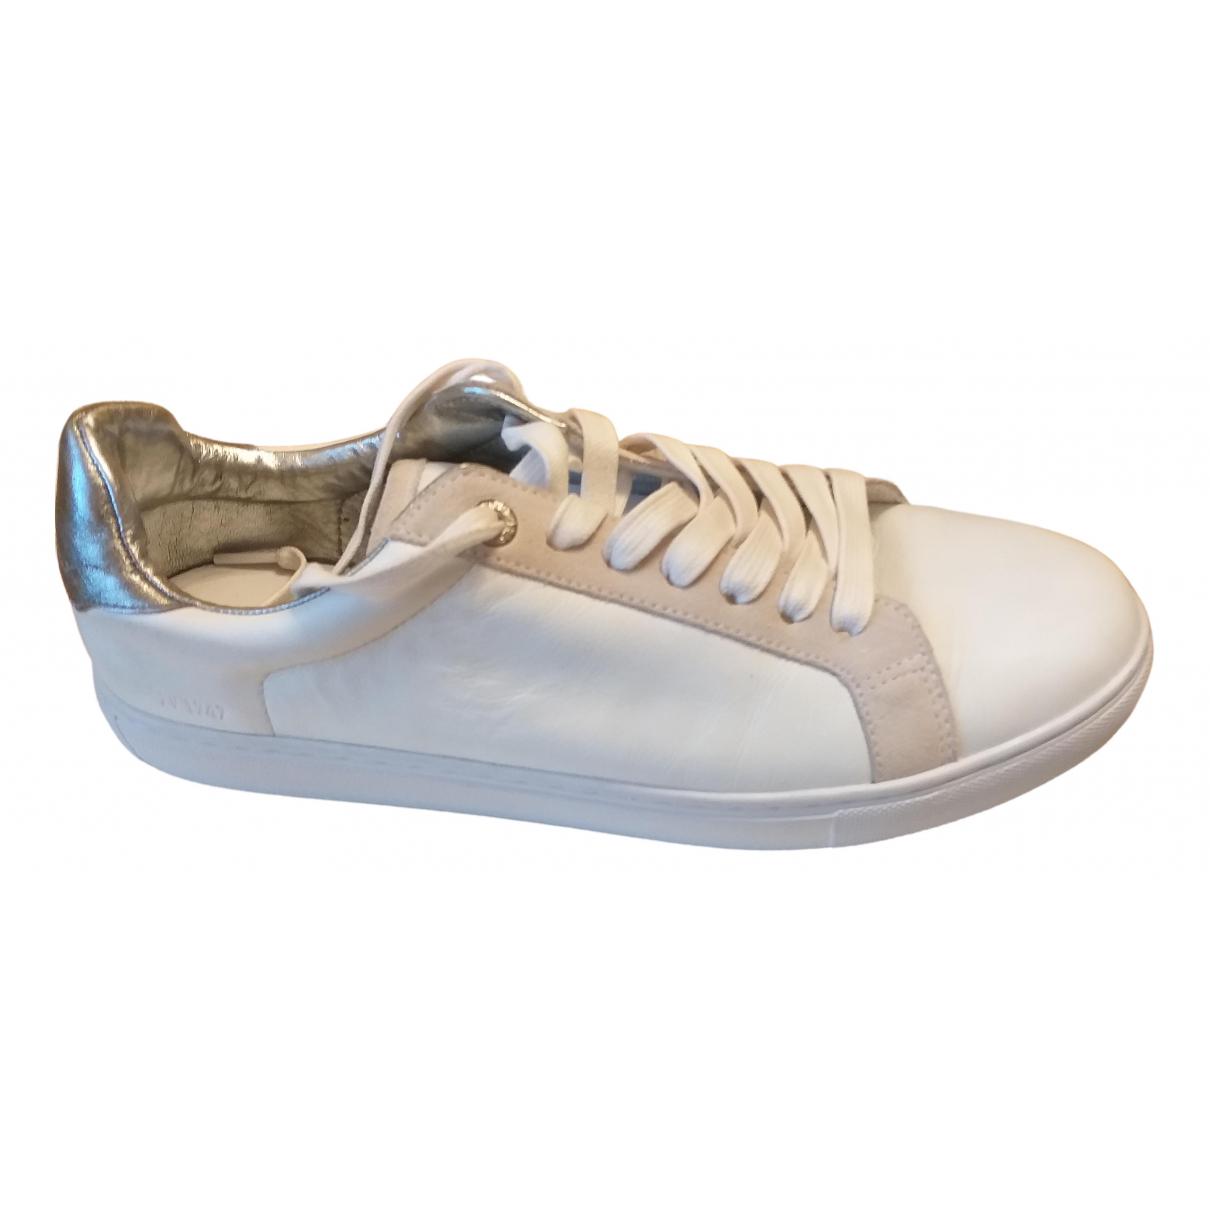 Zadig & Voltaire Spring Summer 2020 Sneakers in  Weiss Leder